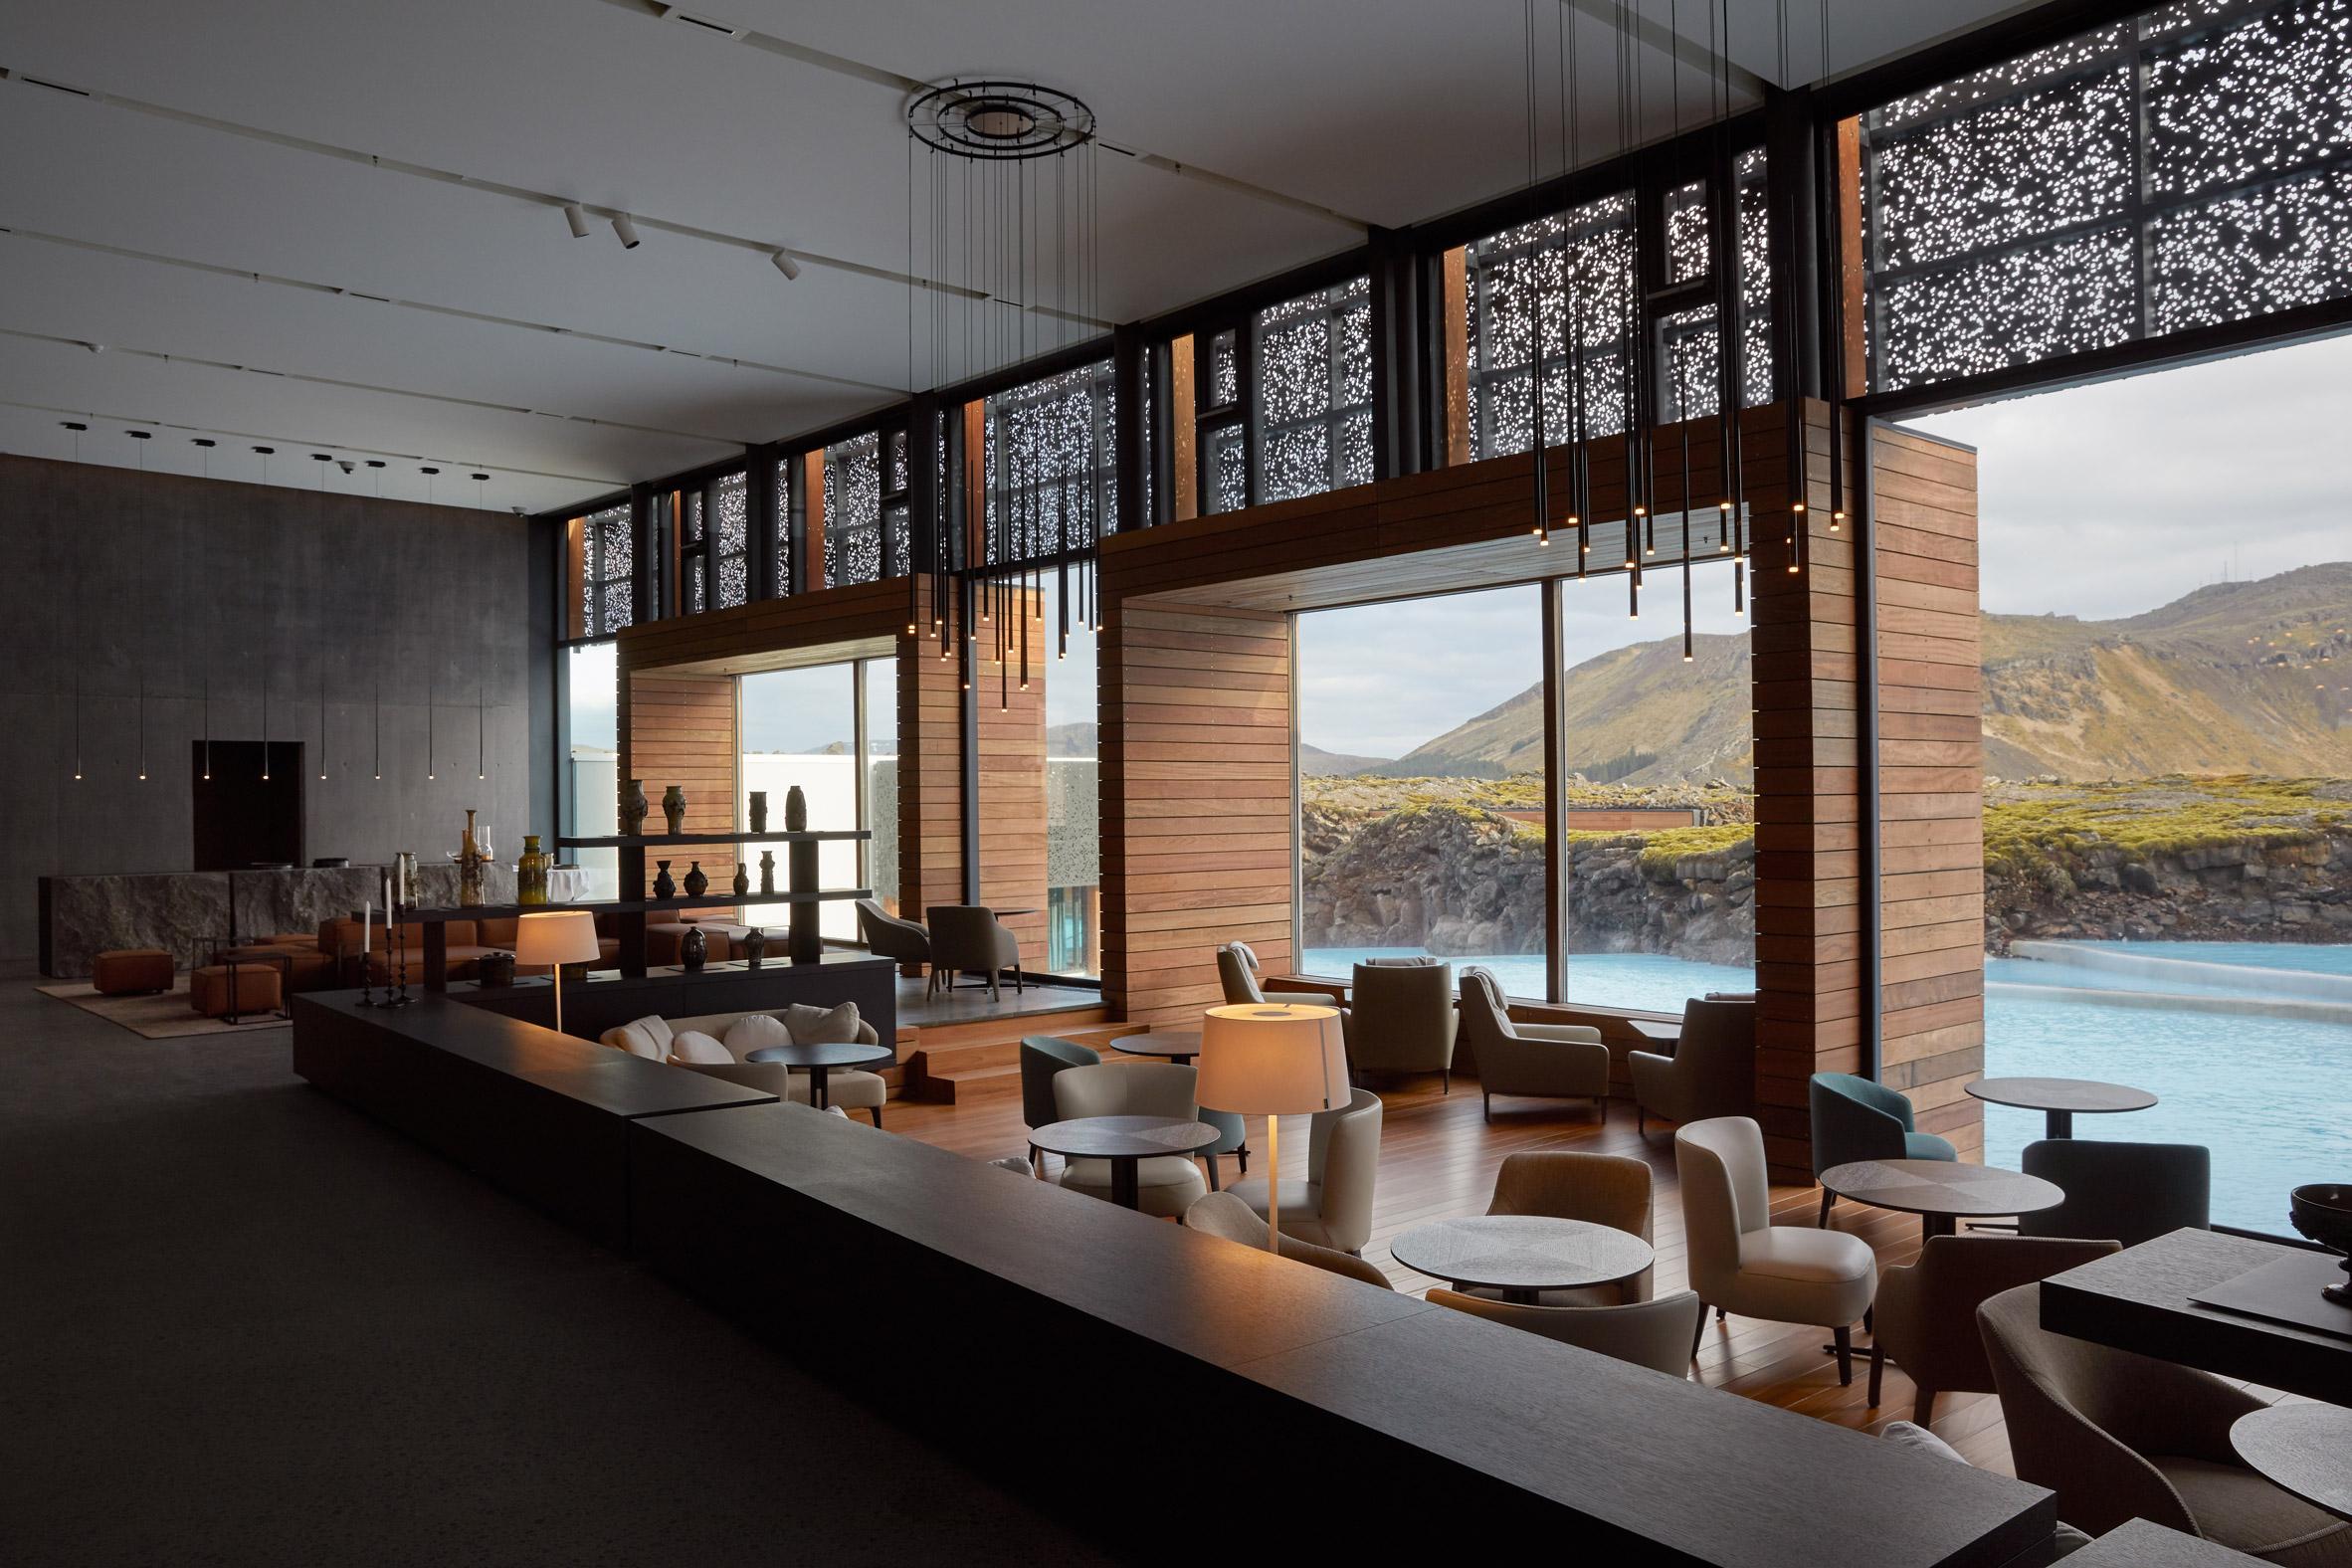 Thiết kế nội thất Resort 8